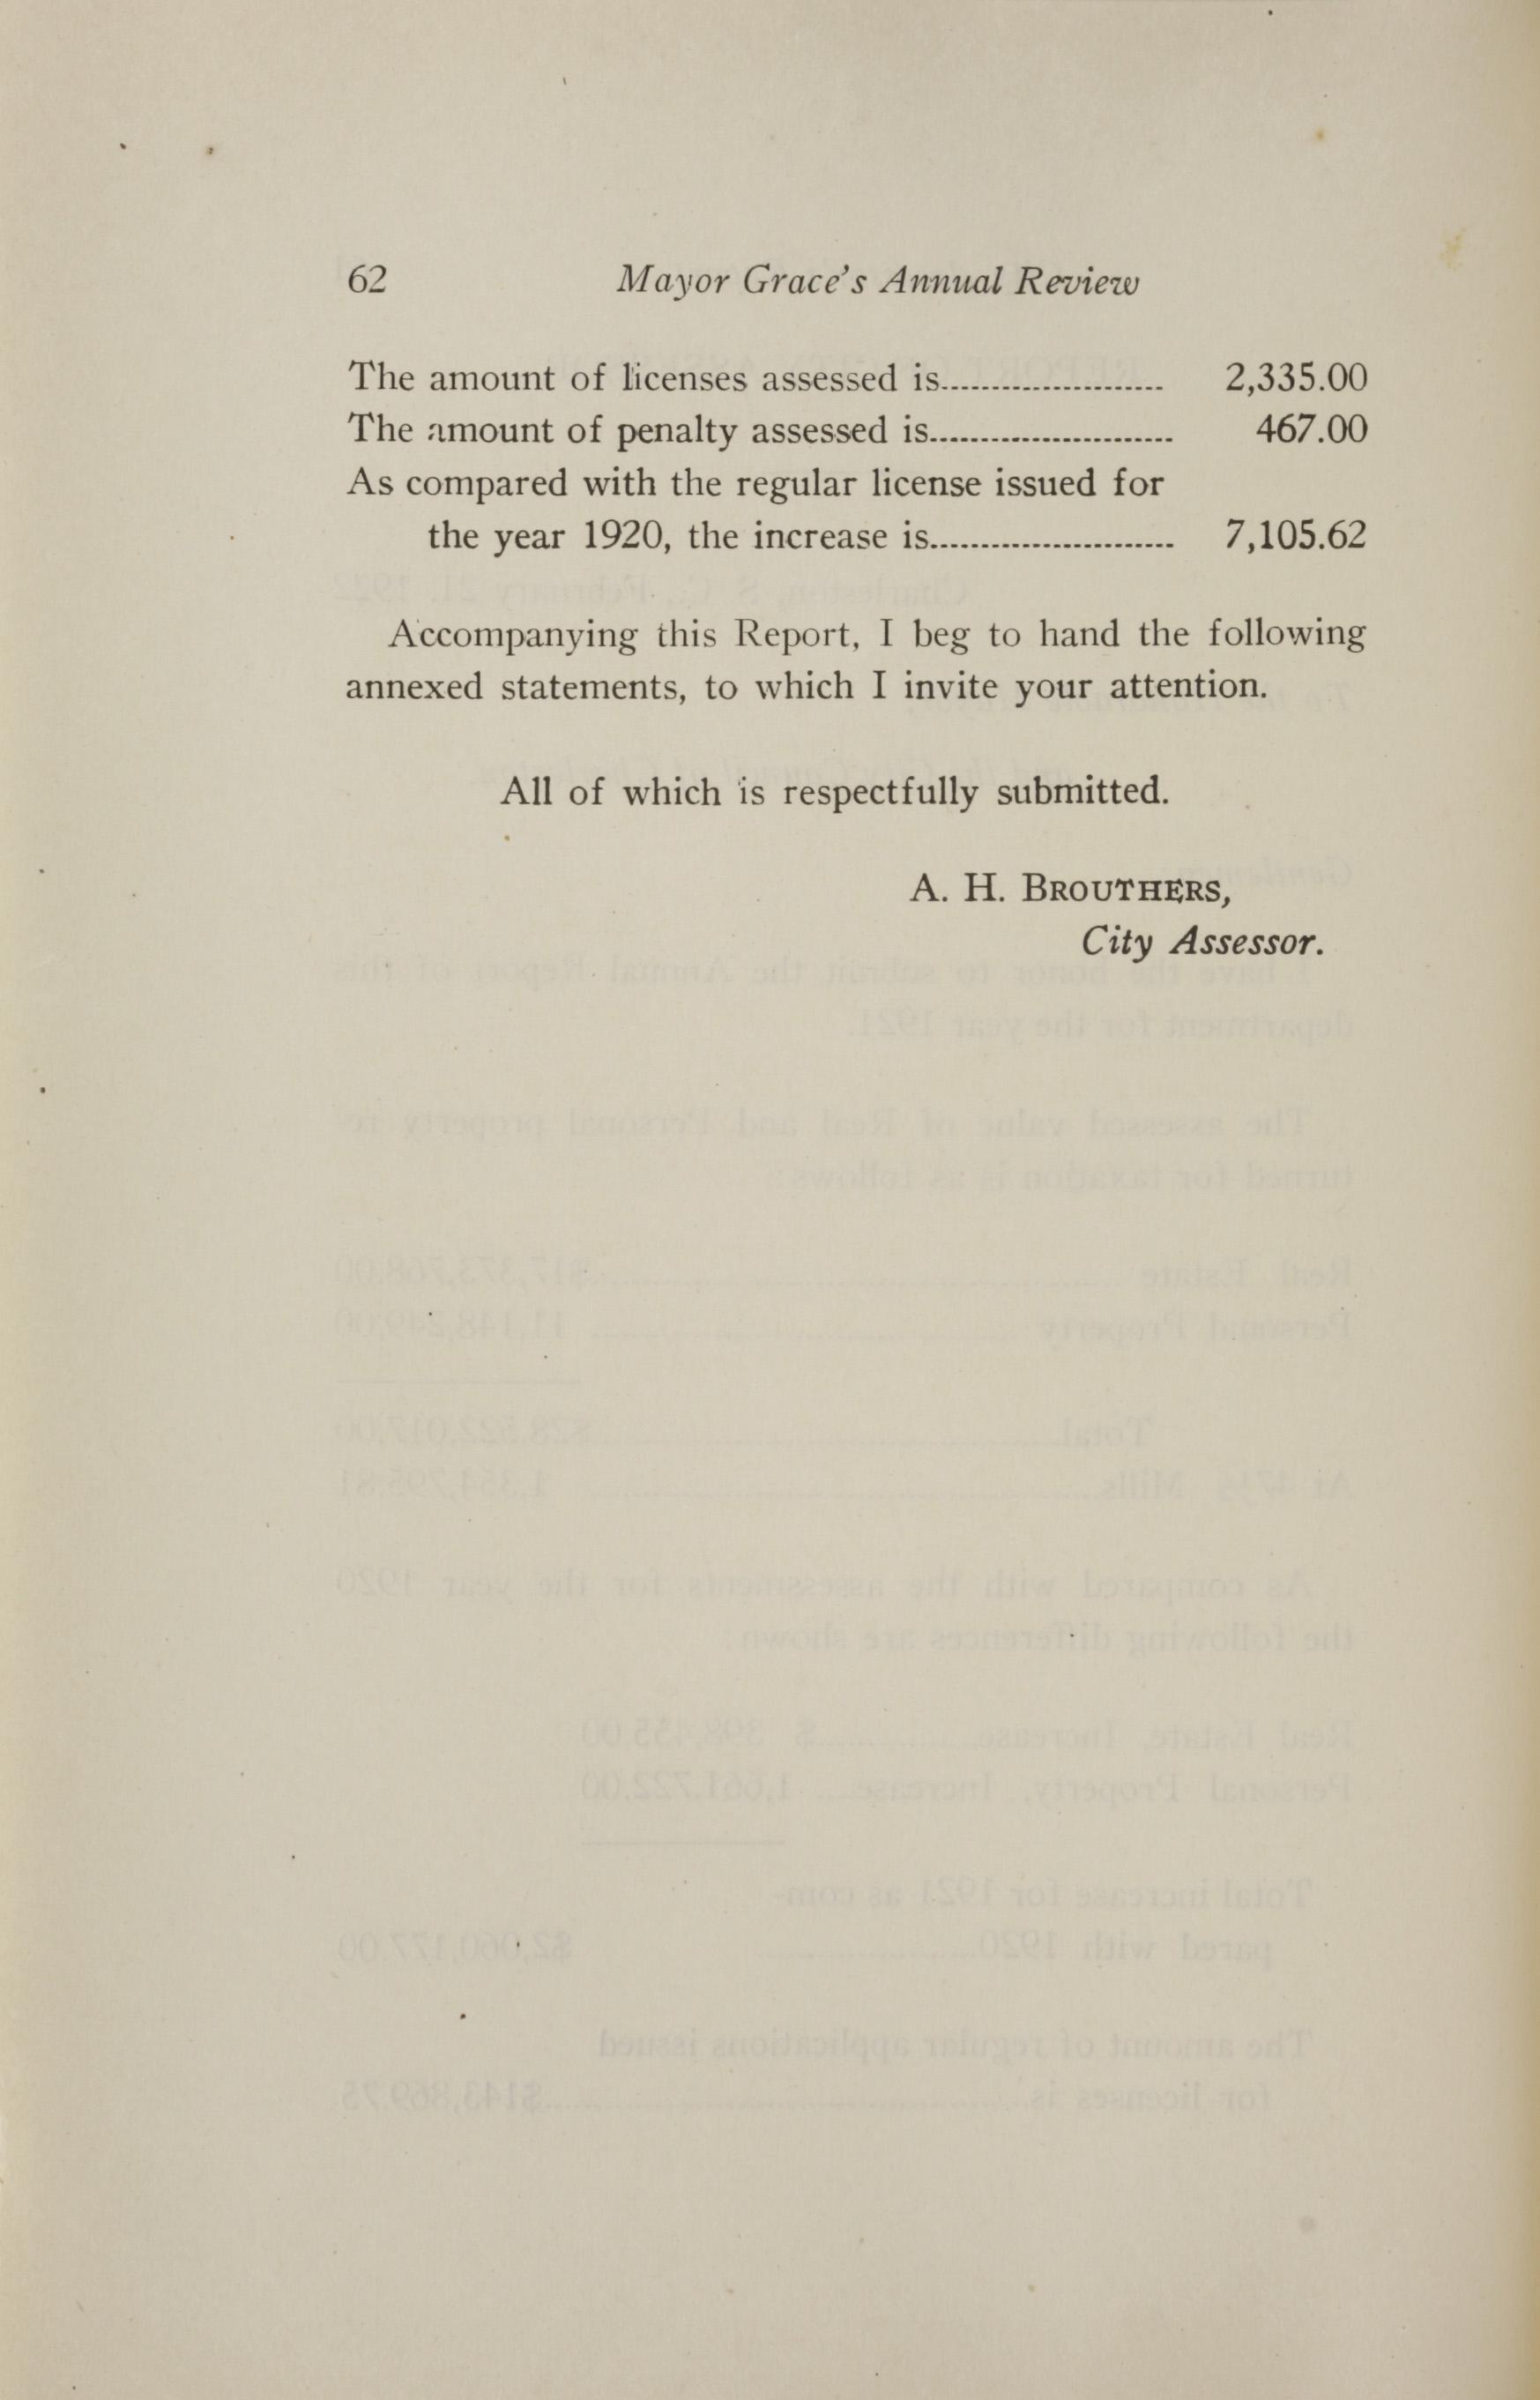 Charleston Yearbook, 1921, page 62